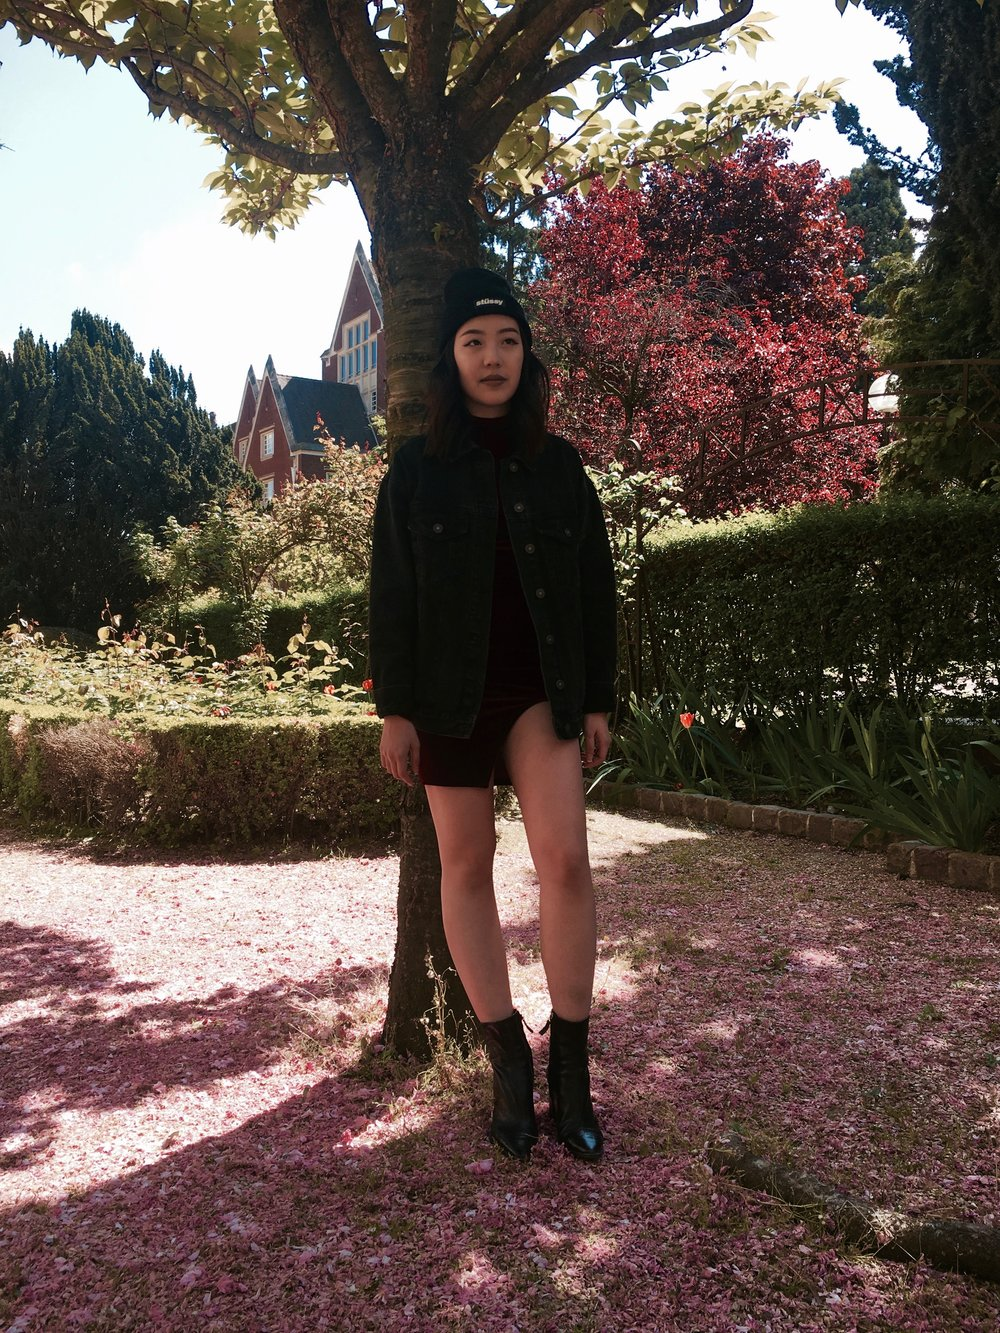 Heeyoung is wearing an Akira dress, a Bershka Collection denim jacket, a Stüssy beanie, and Zara boots.